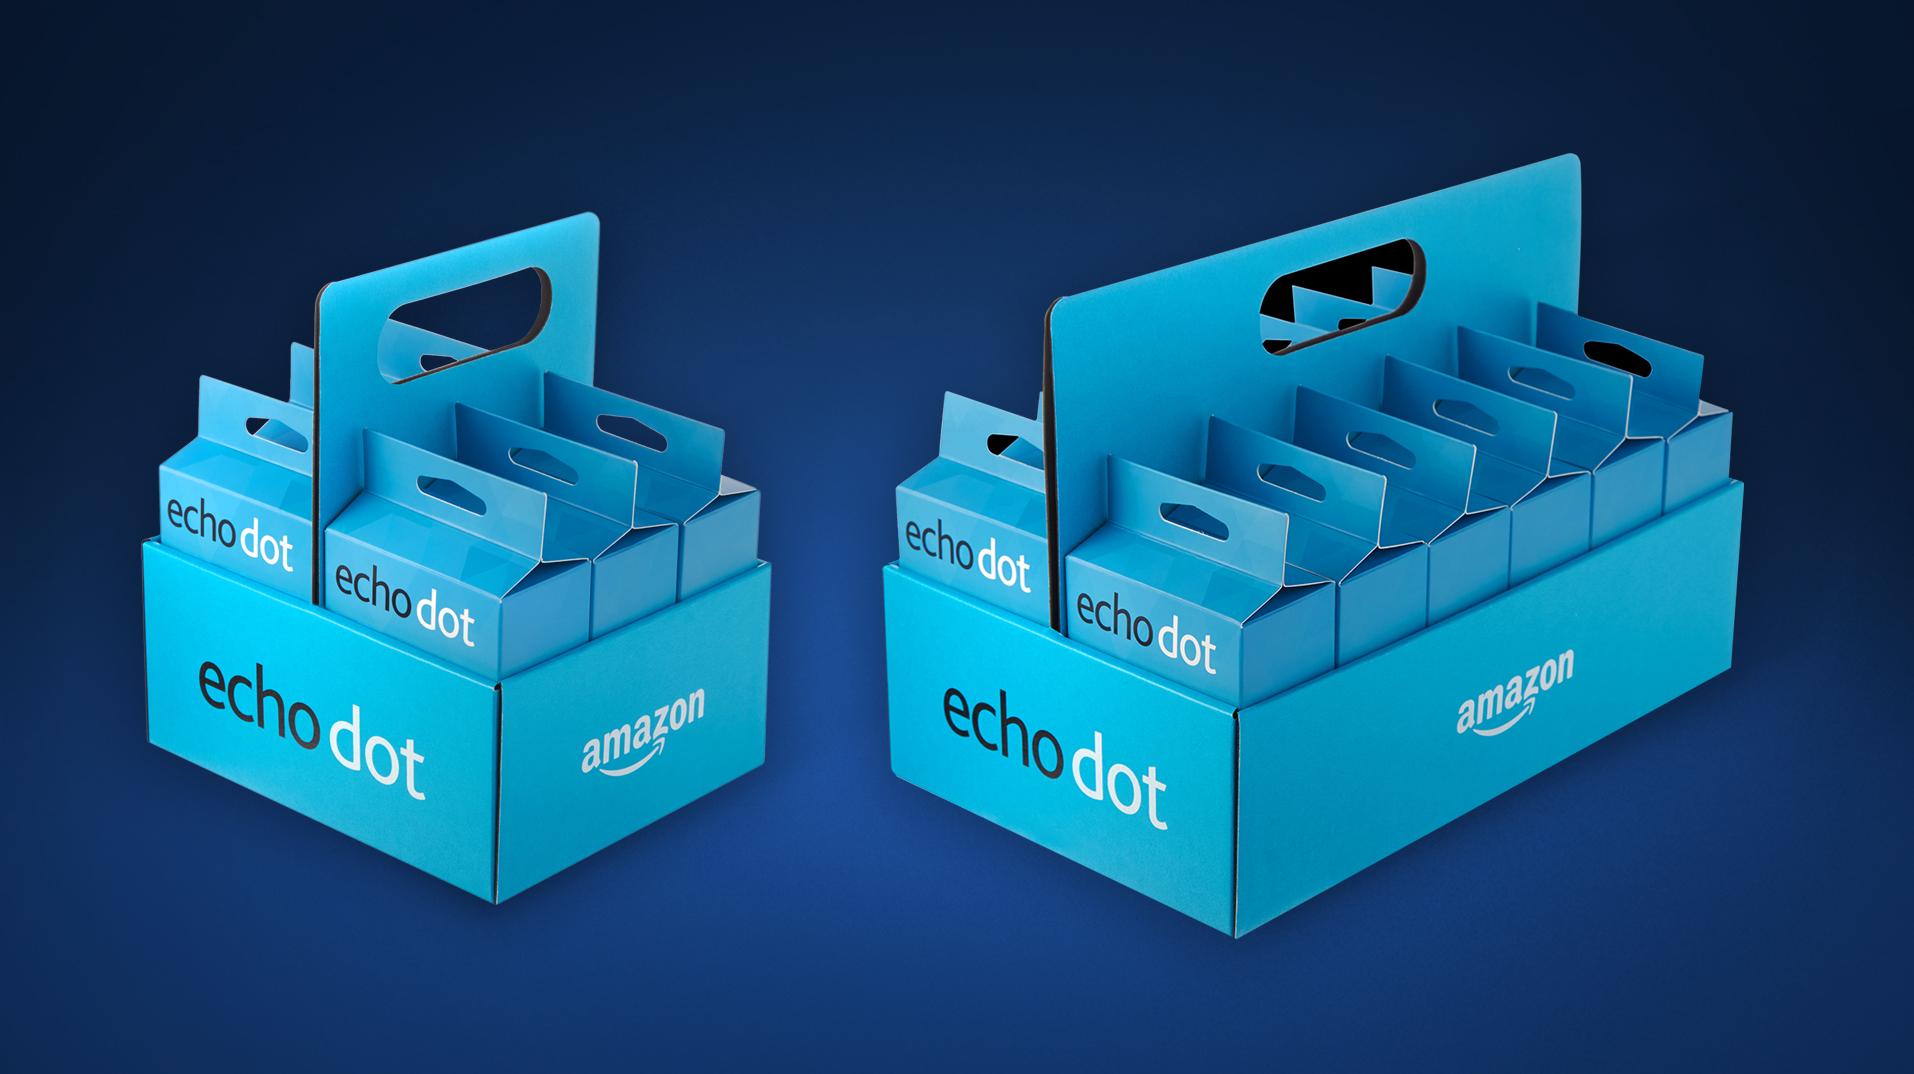 amazon announces cheaper and better echo dot will. Black Bedroom Furniture Sets. Home Design Ideas